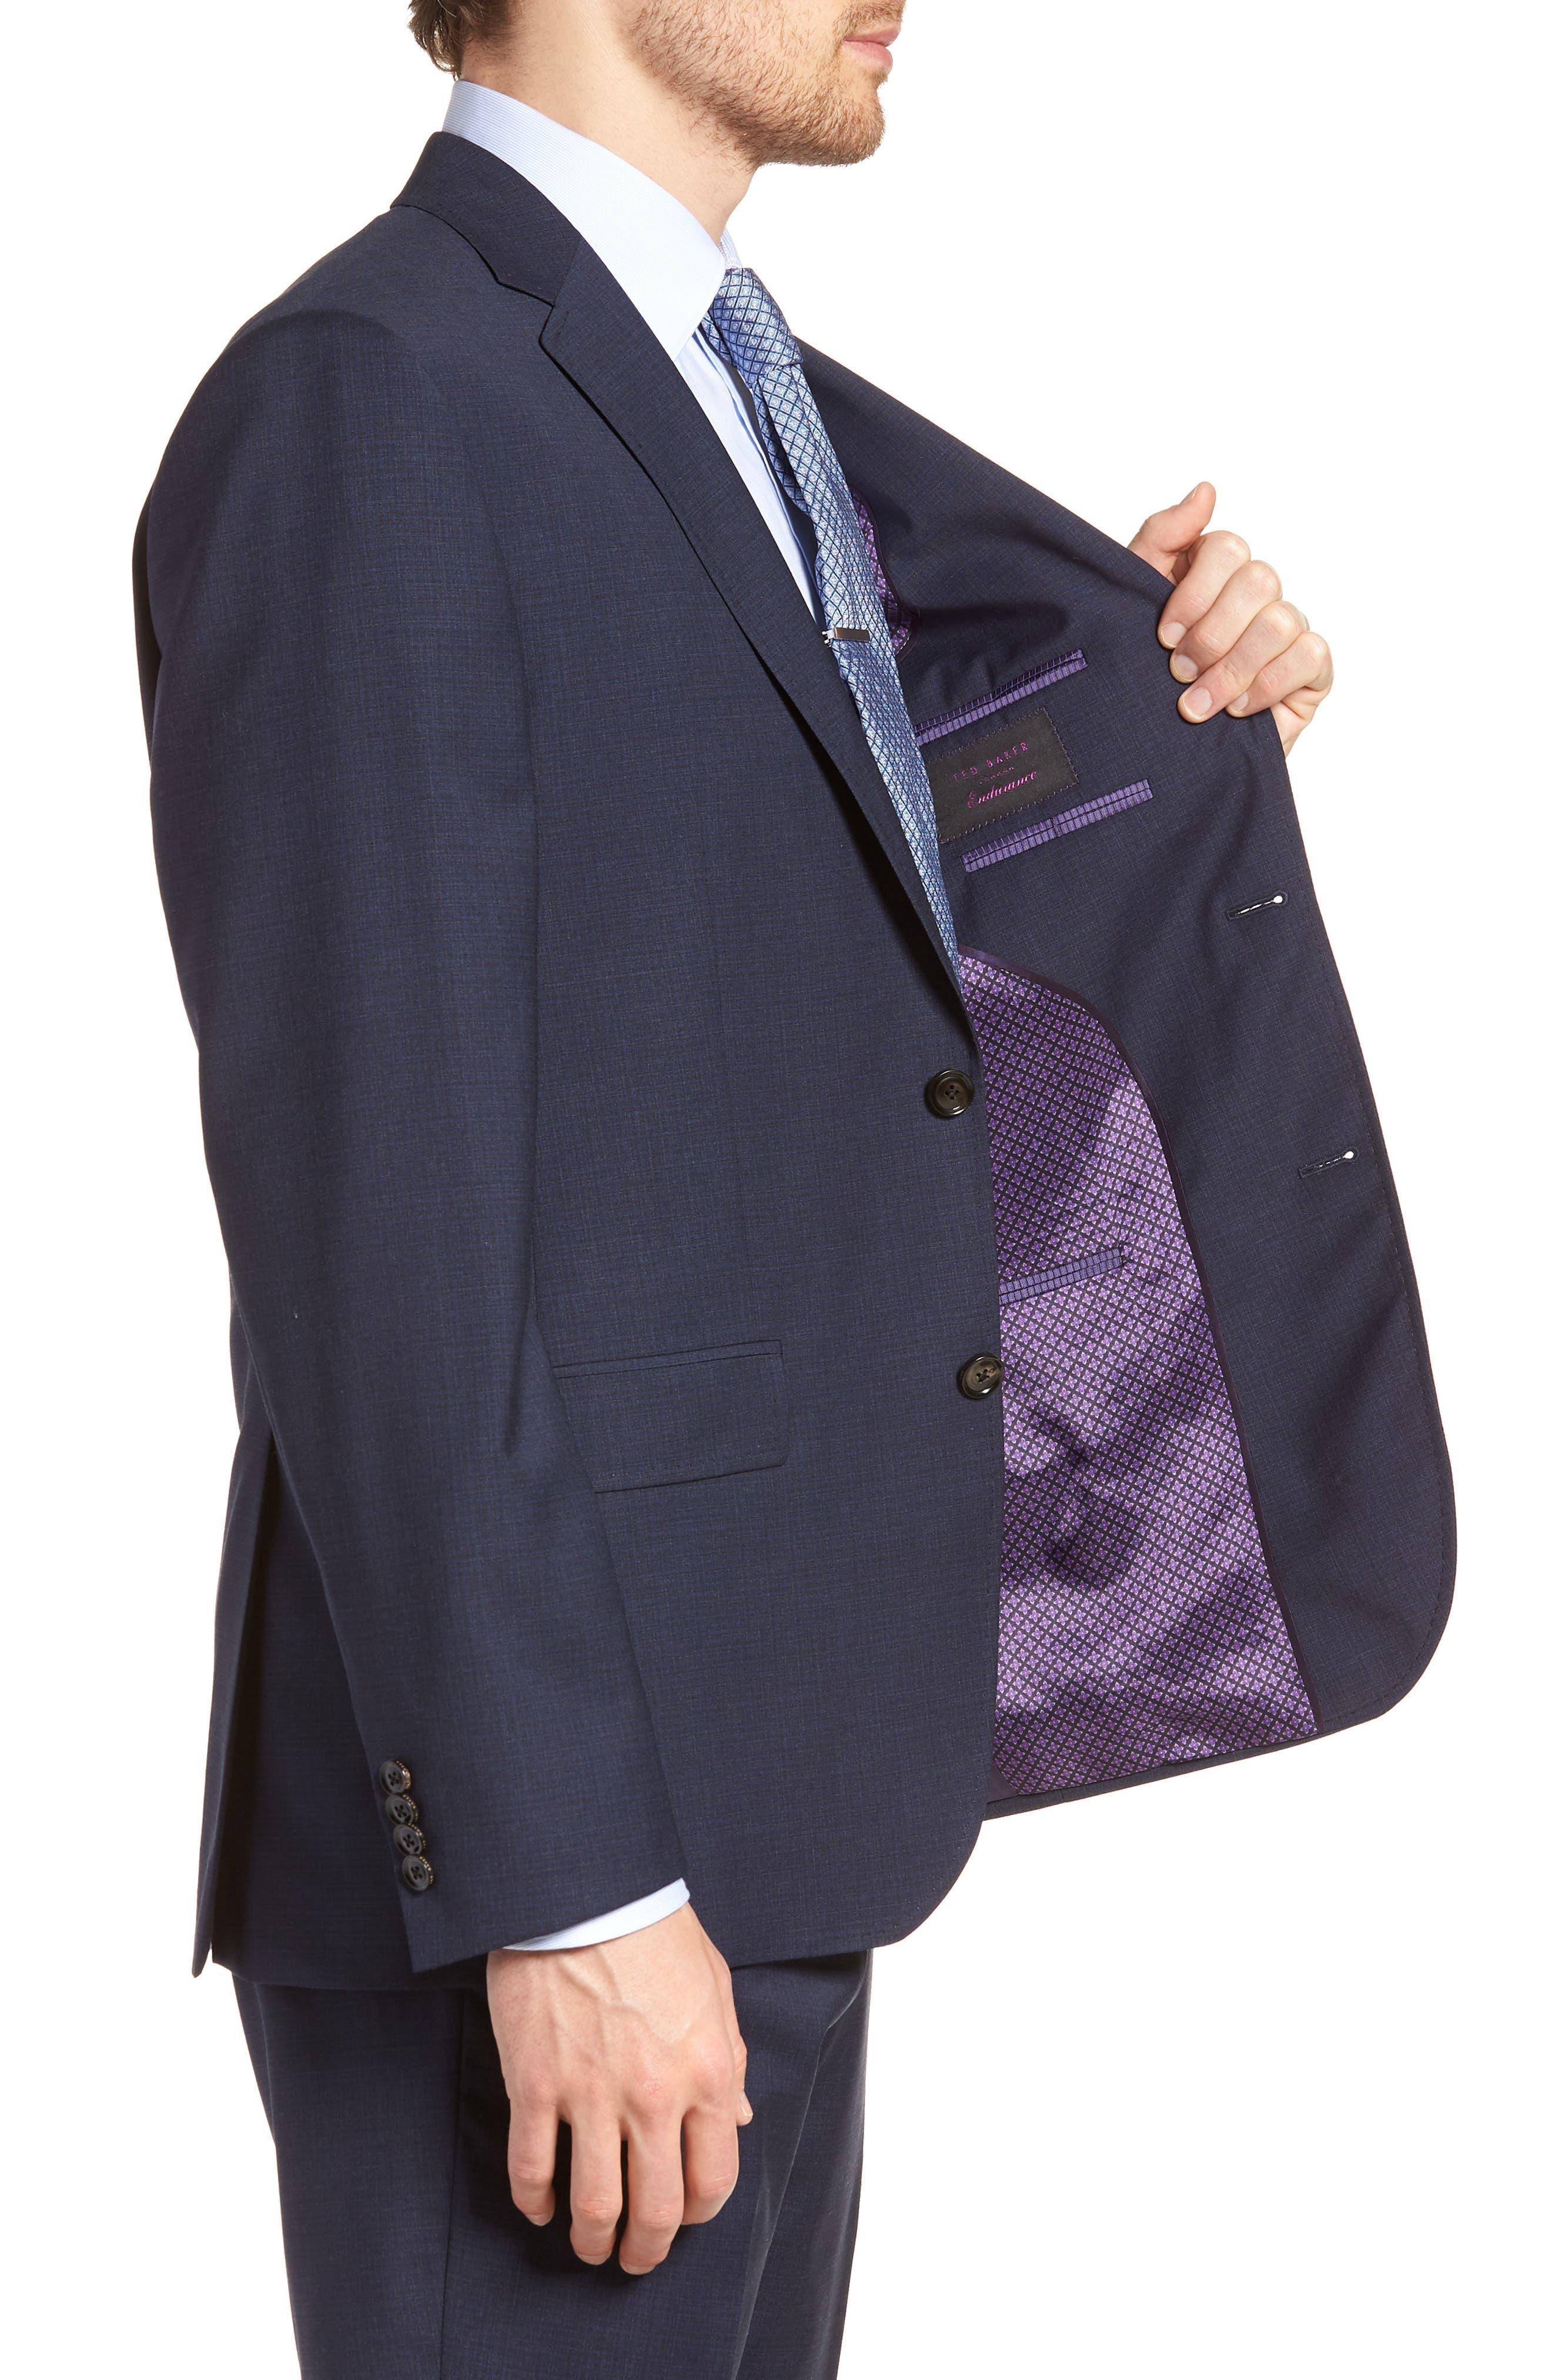 Jay Trim Fit Solid Wool Suit,                             Alternate thumbnail 4, color,                             BLUE